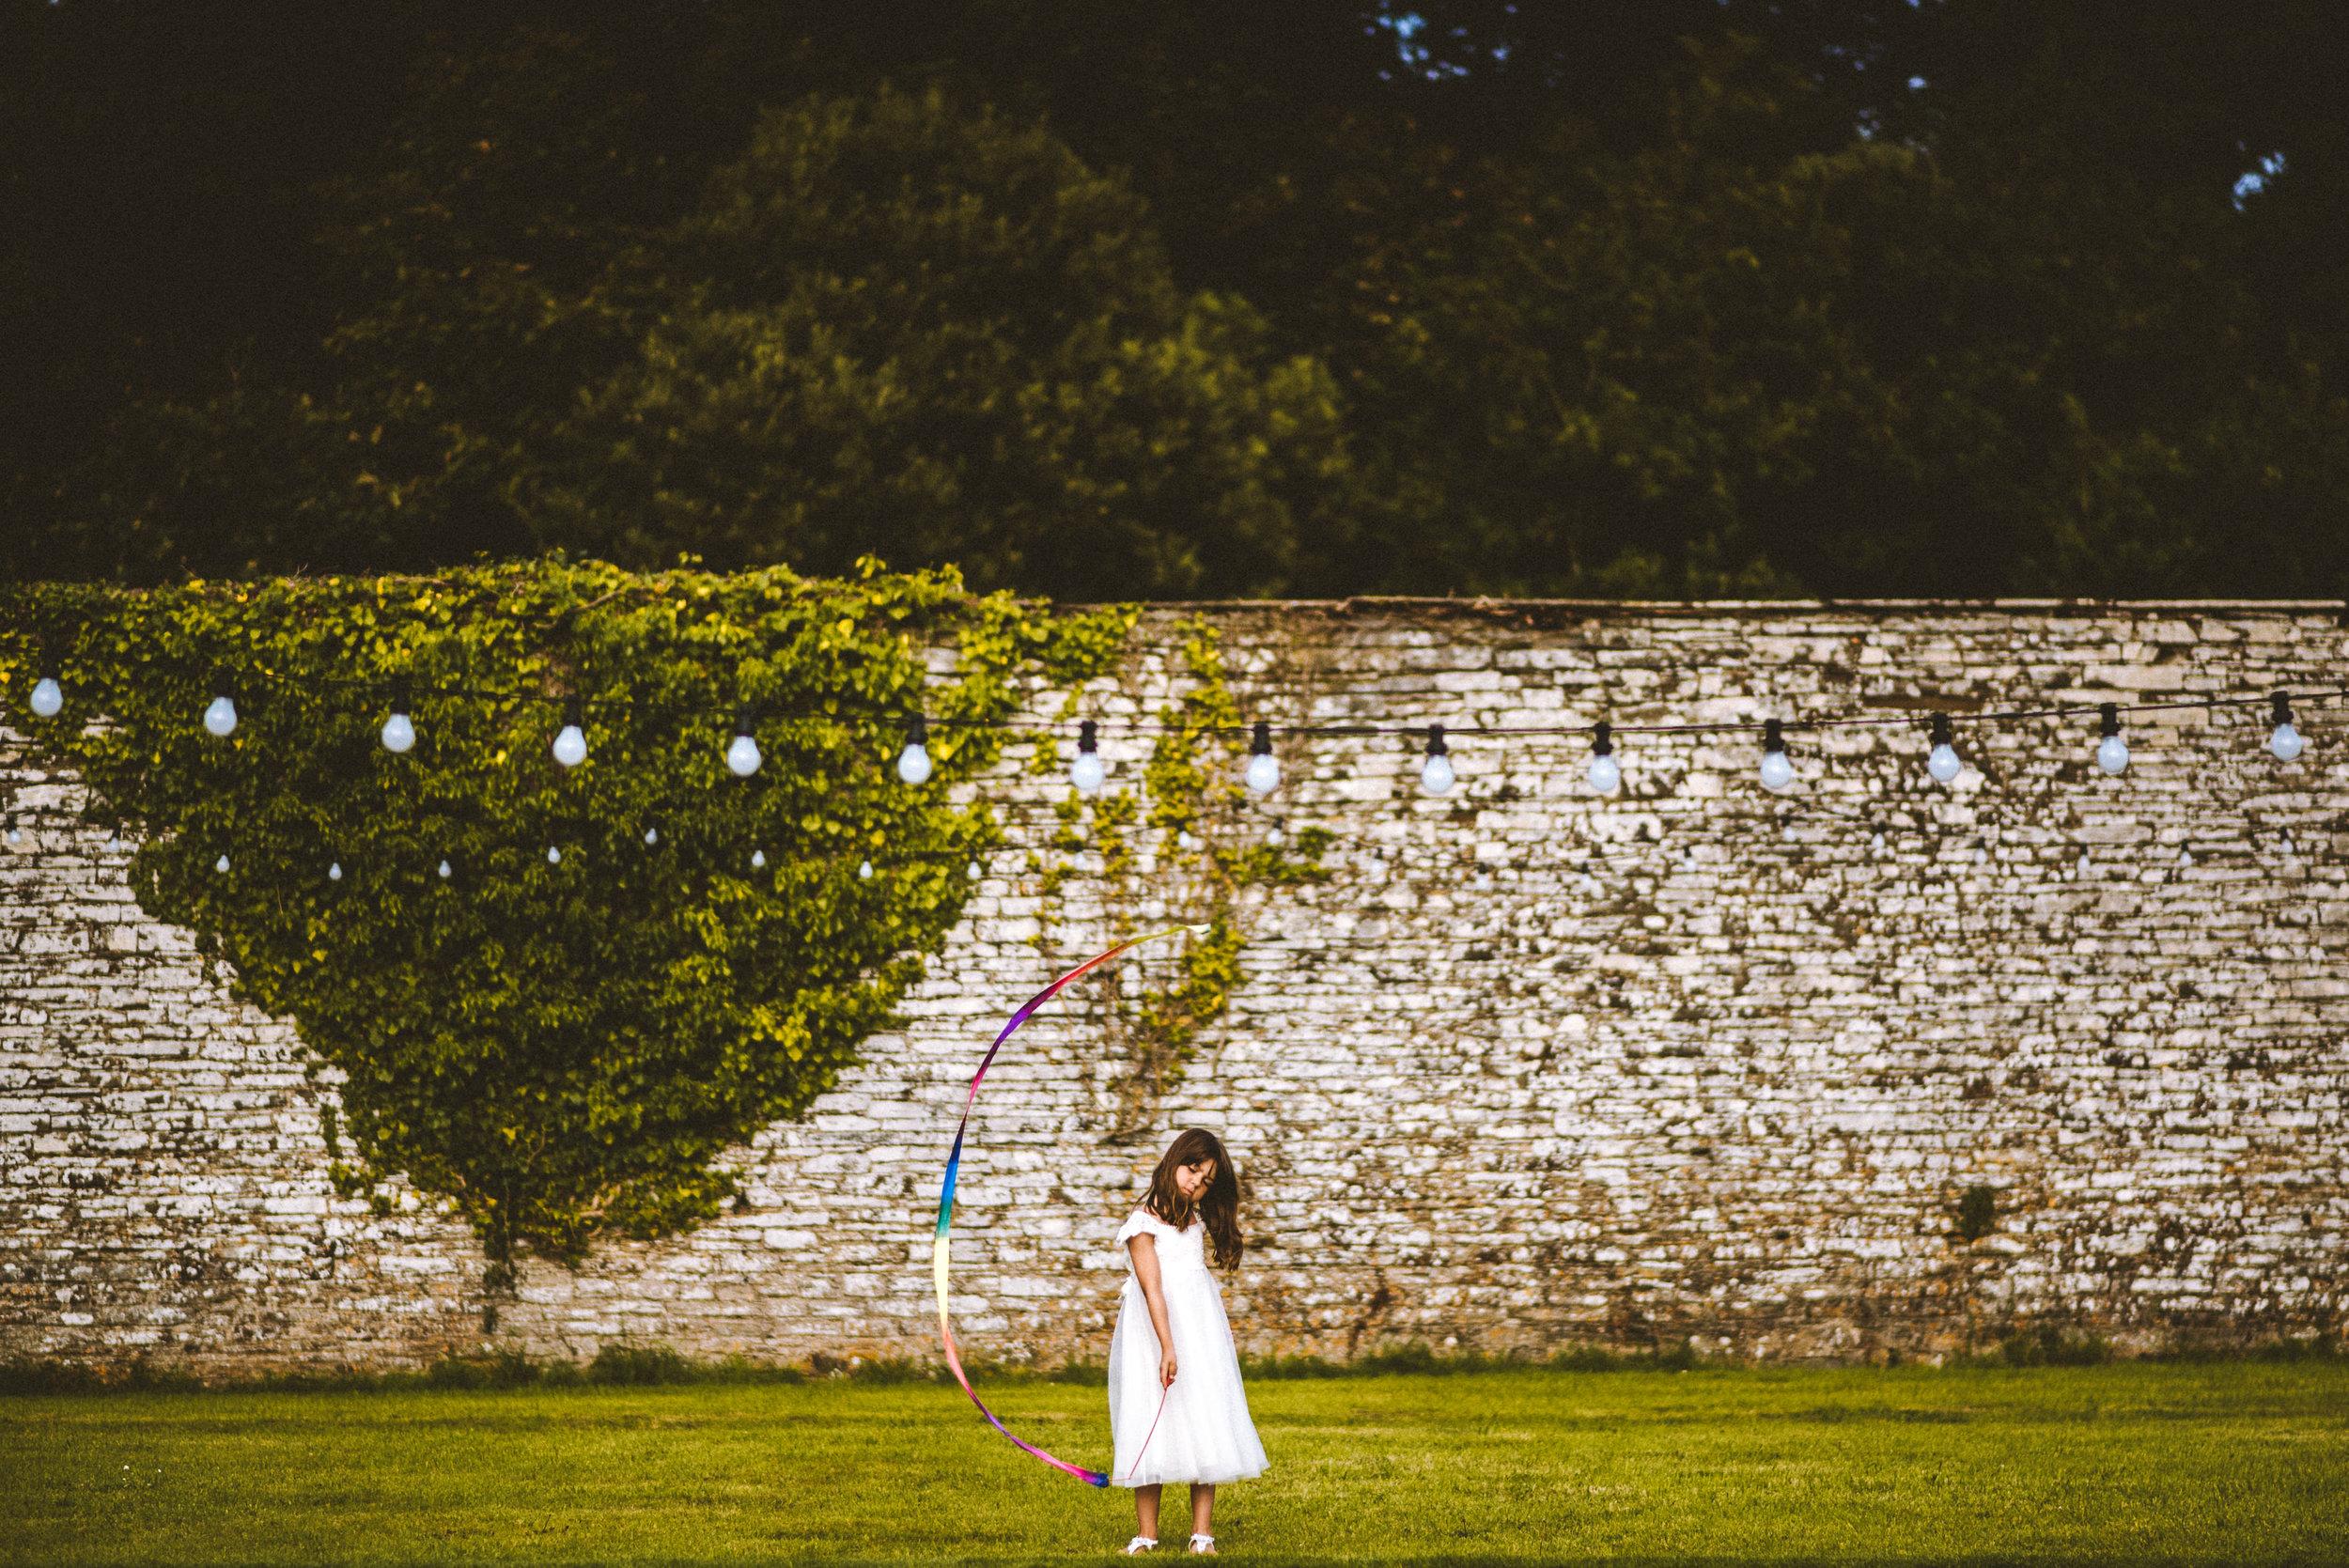 pencarrow-house-wedding-photographer-125.jpg